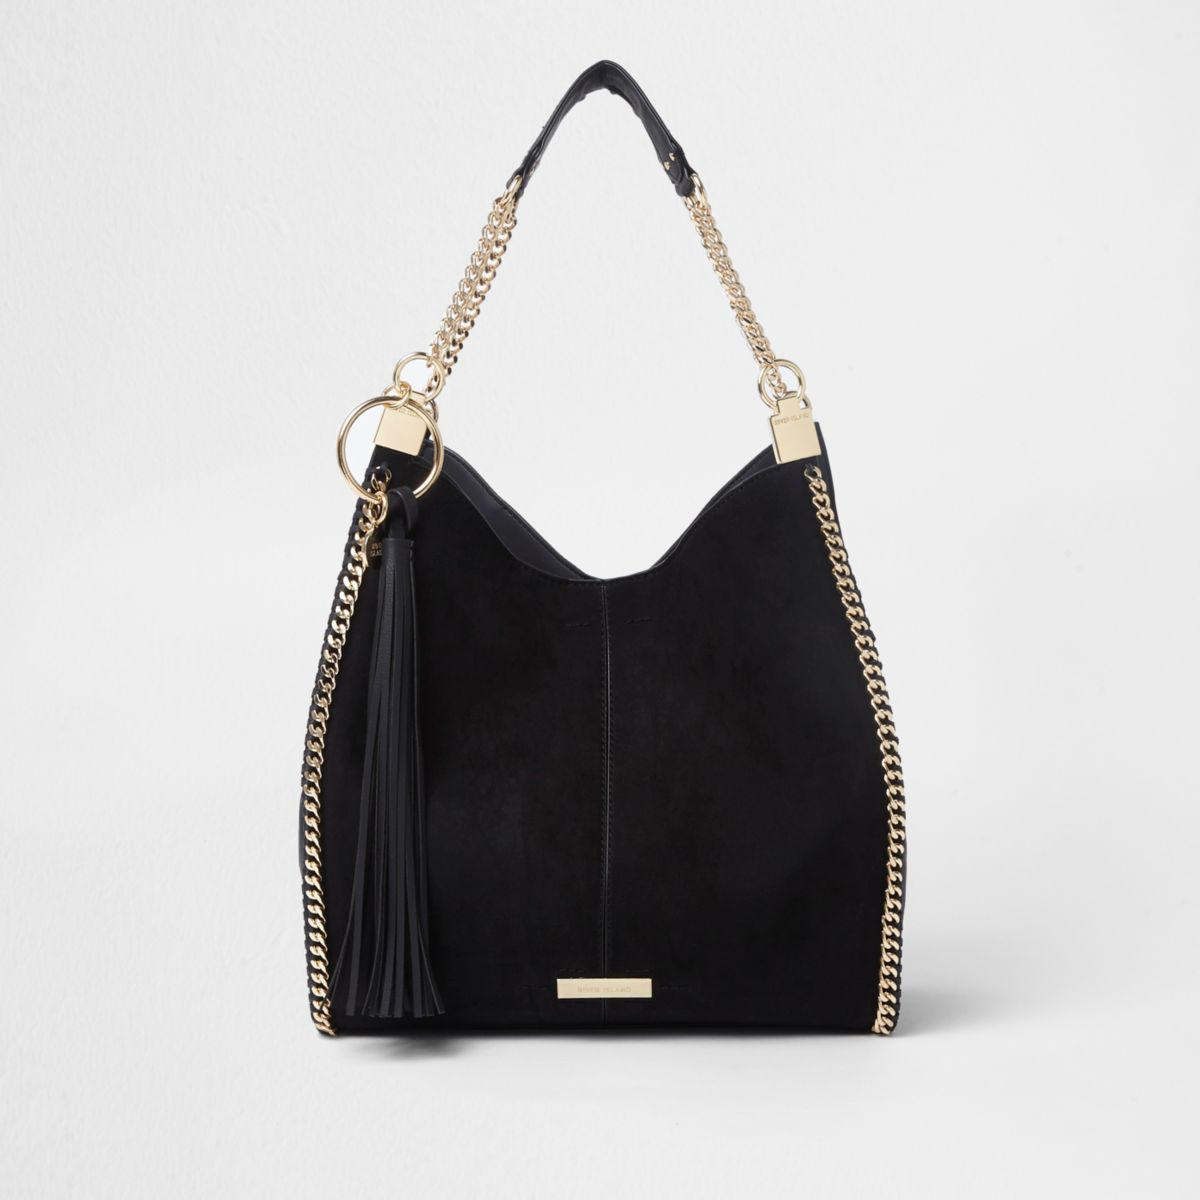 Ruime zwarte handtas met kettingrand